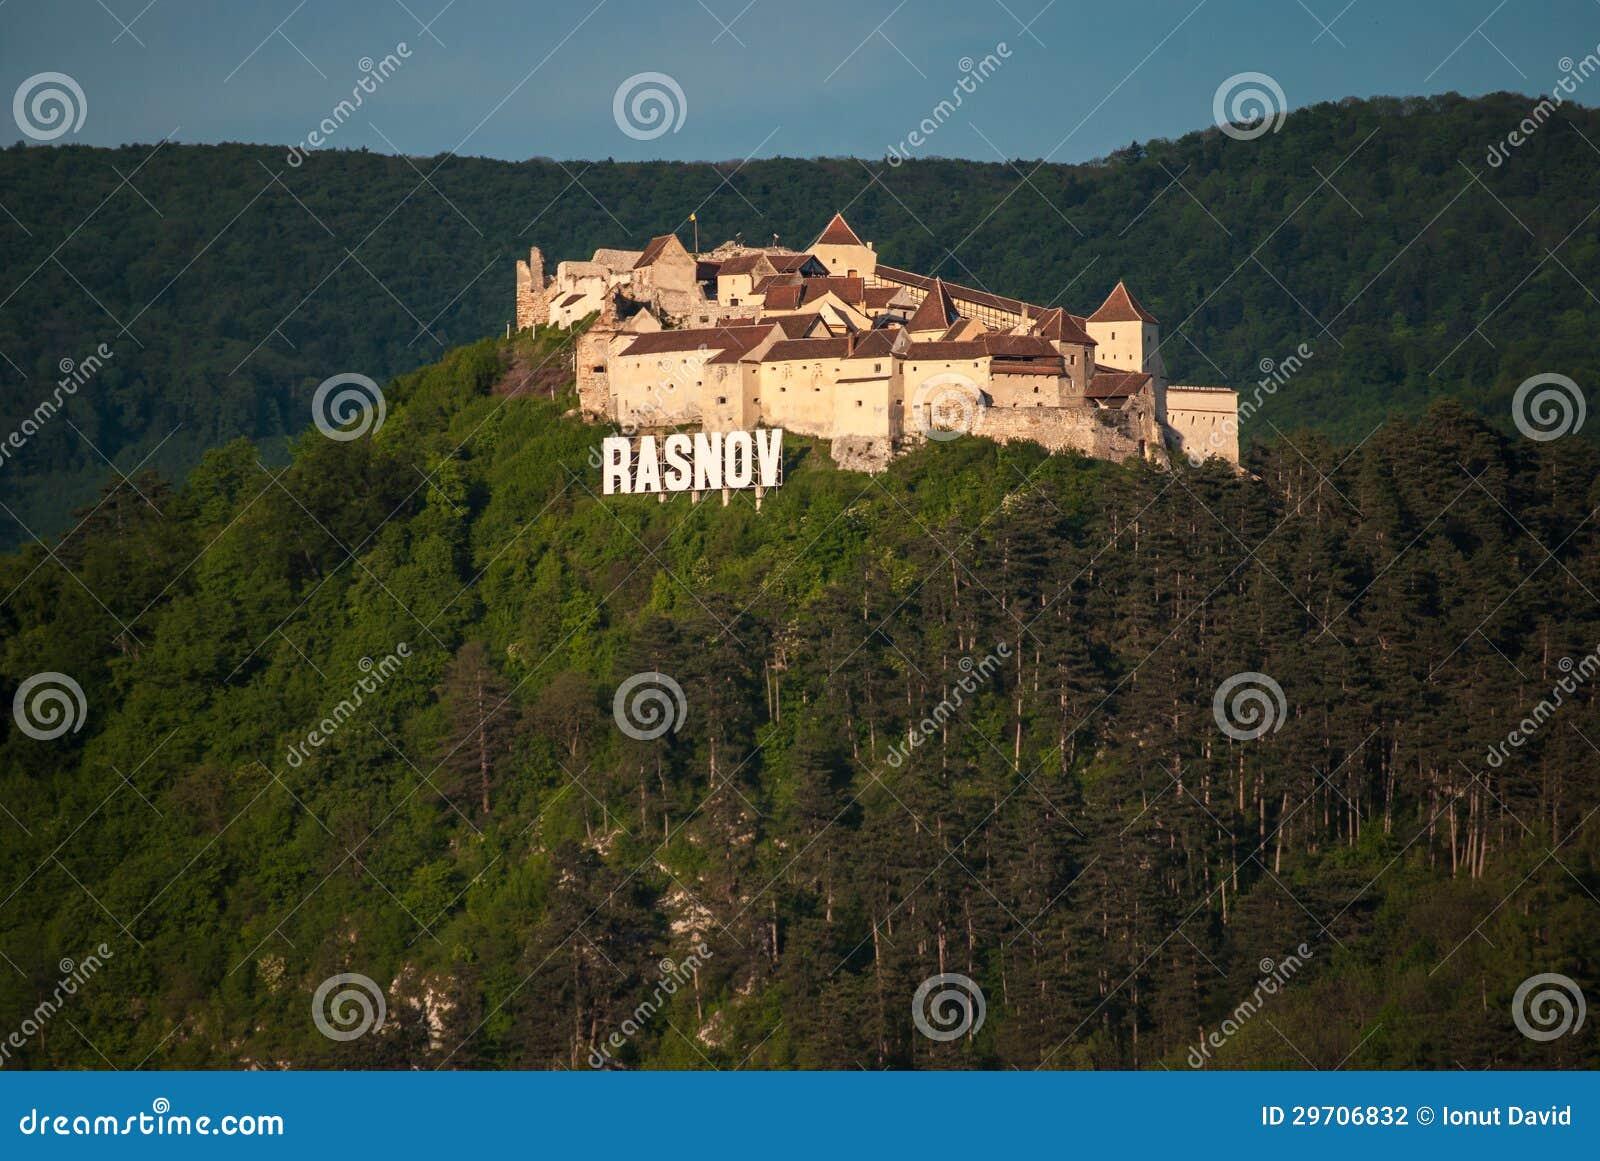 Download Rasnov Fortress stock photo. Image of landscape, rock - 29706832